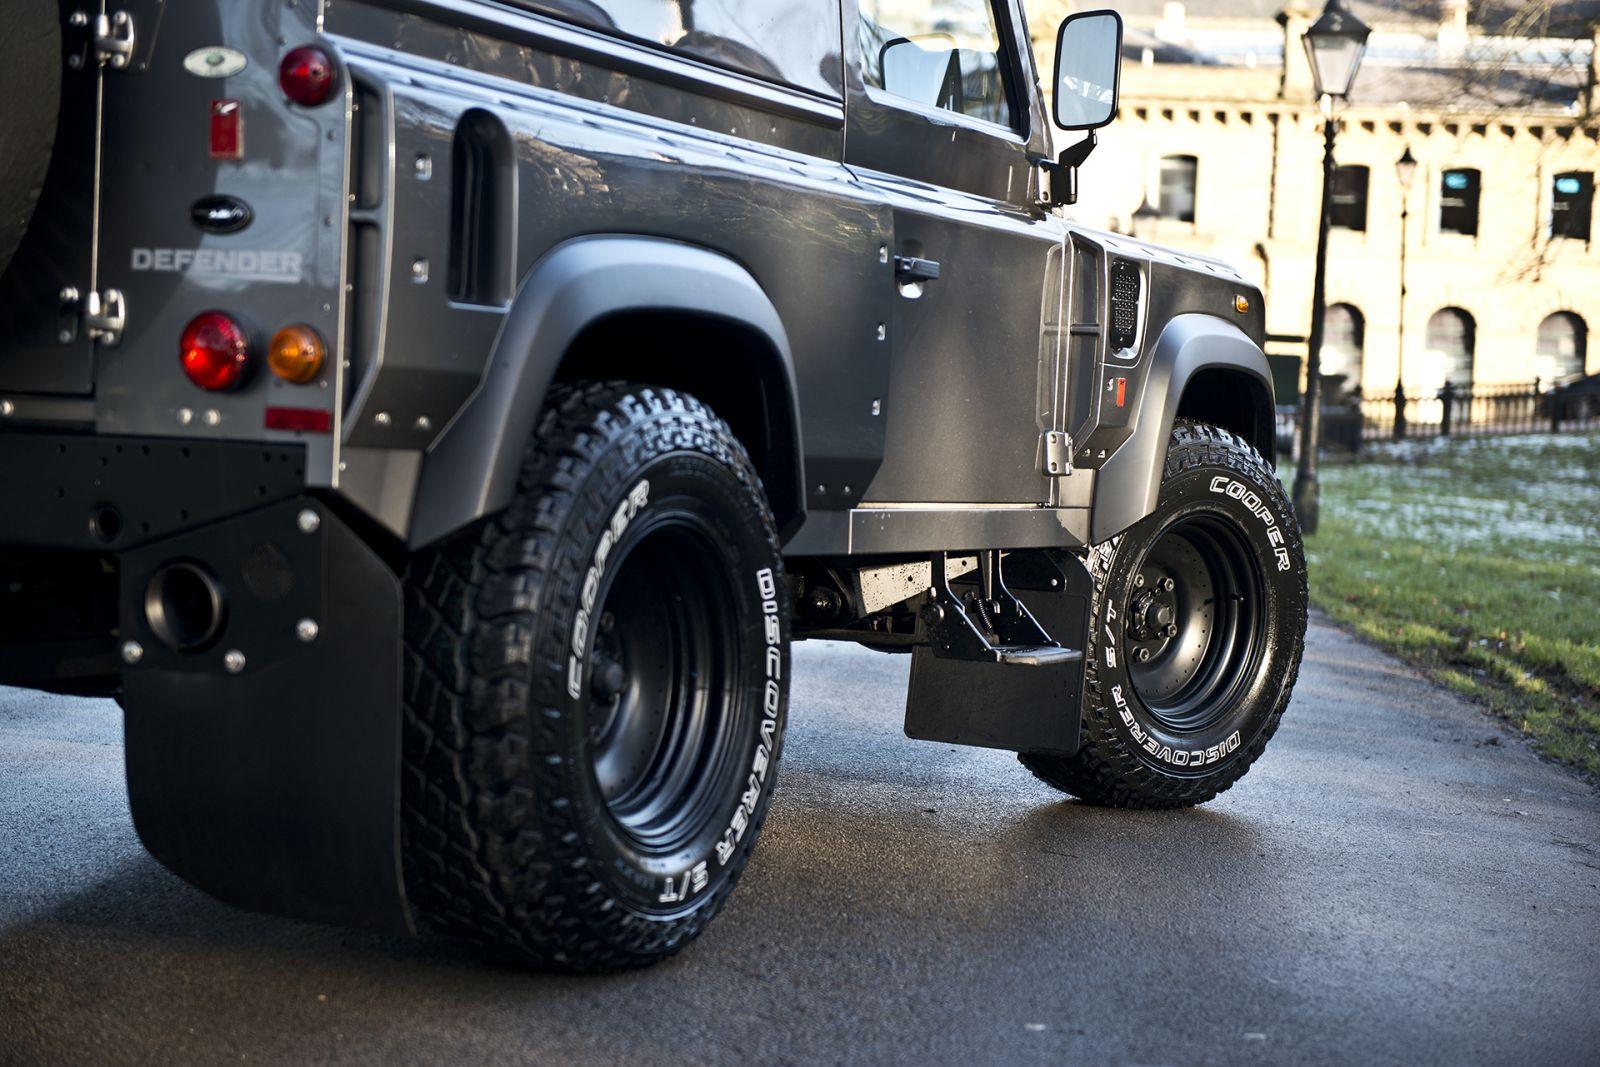 Grey-Chelsea-Truck-Co-Defender-Cooper-Discoverer-ST.jpg